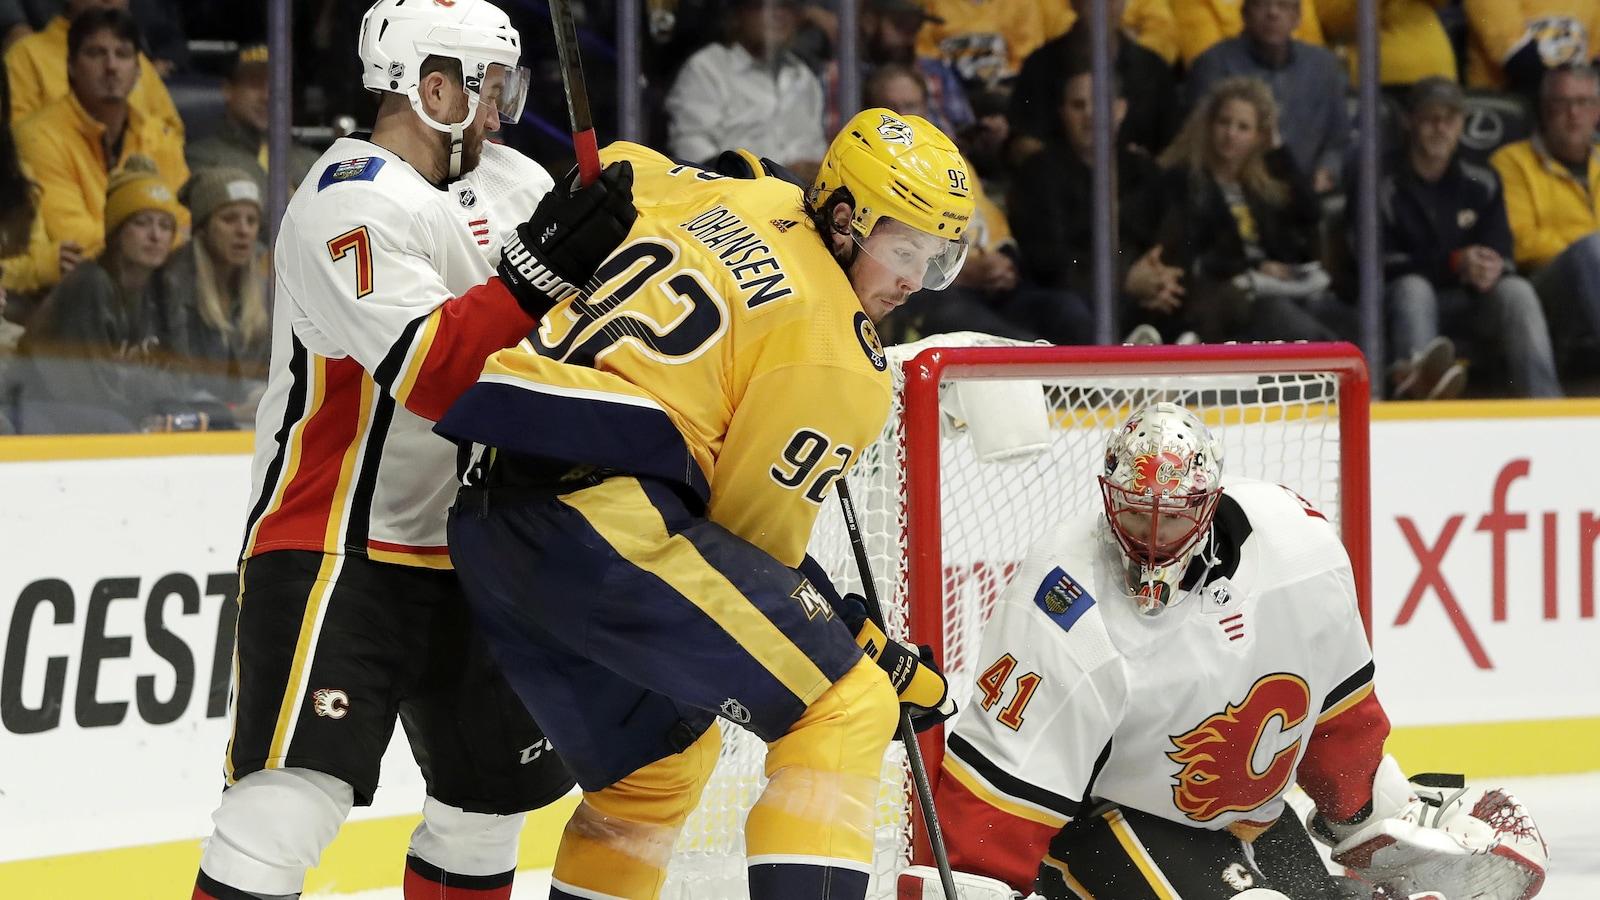 Le gardien des Flames bloque le tire de Ryan Johansen, des Predators.